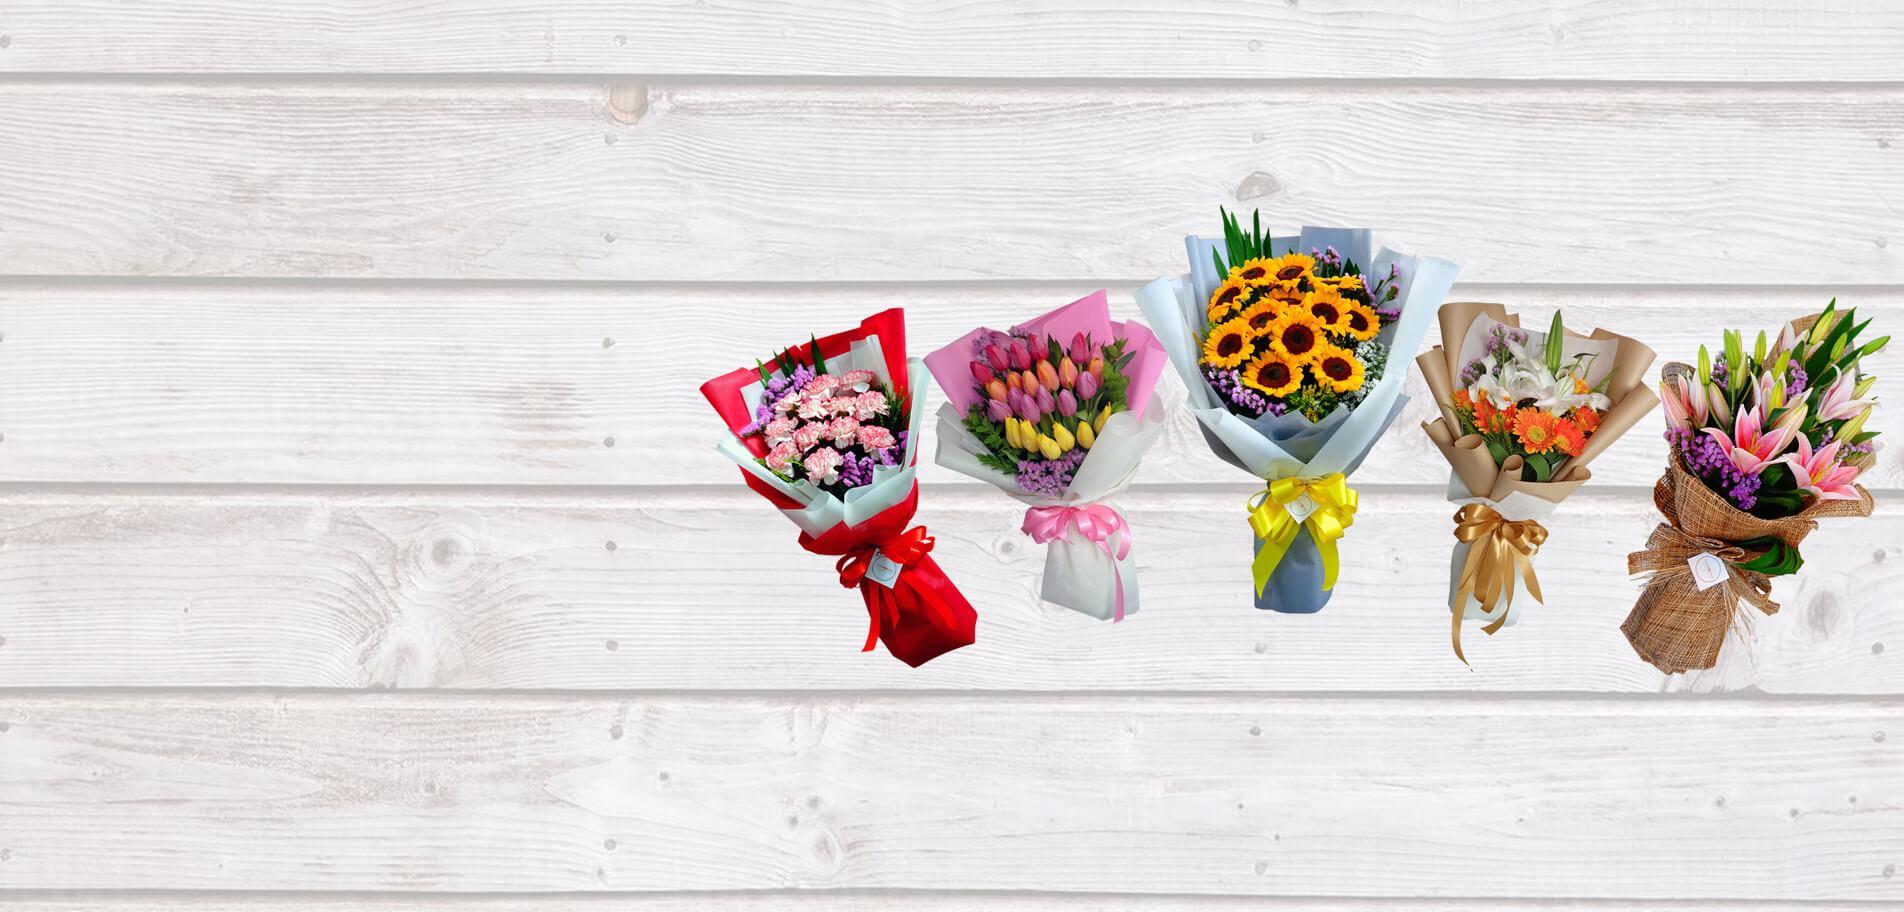 https://yourflowerpatch.com/images/main_slide/bouquet4.jpg